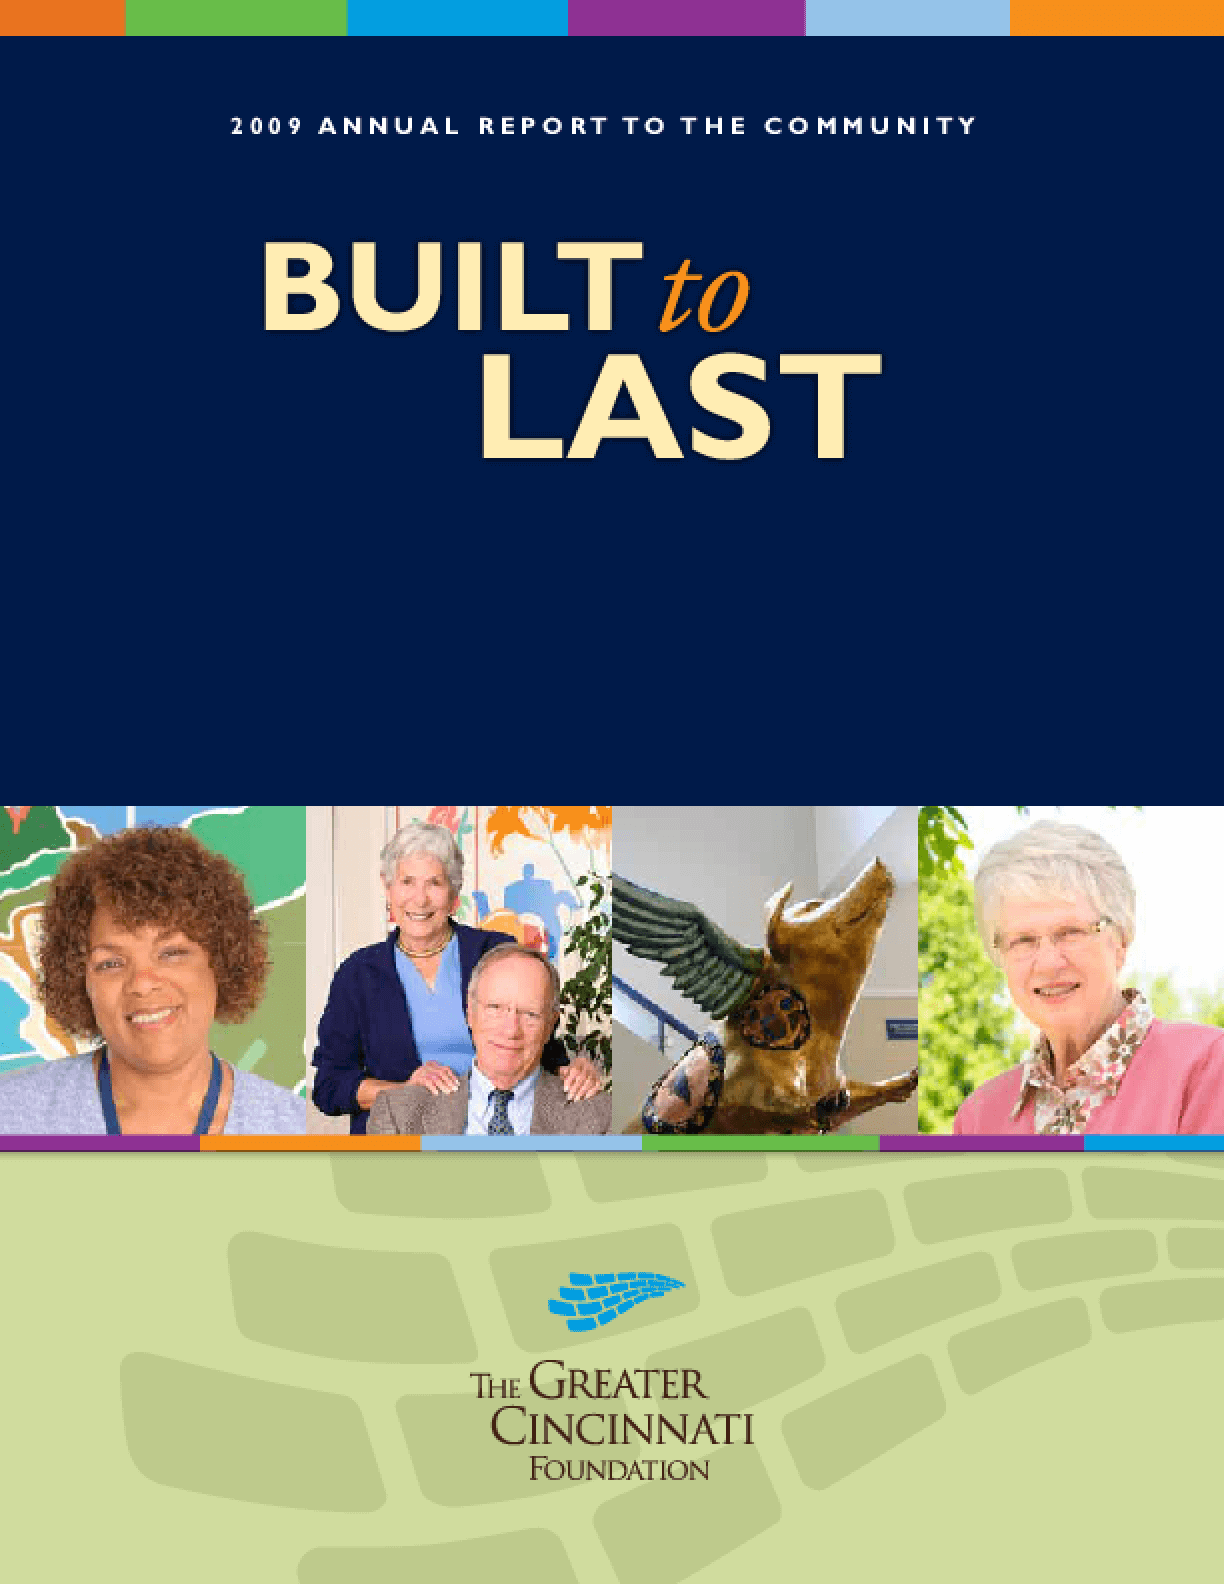 Greater Cincinnati Foundation - 2009 Annual Report: Built to Last